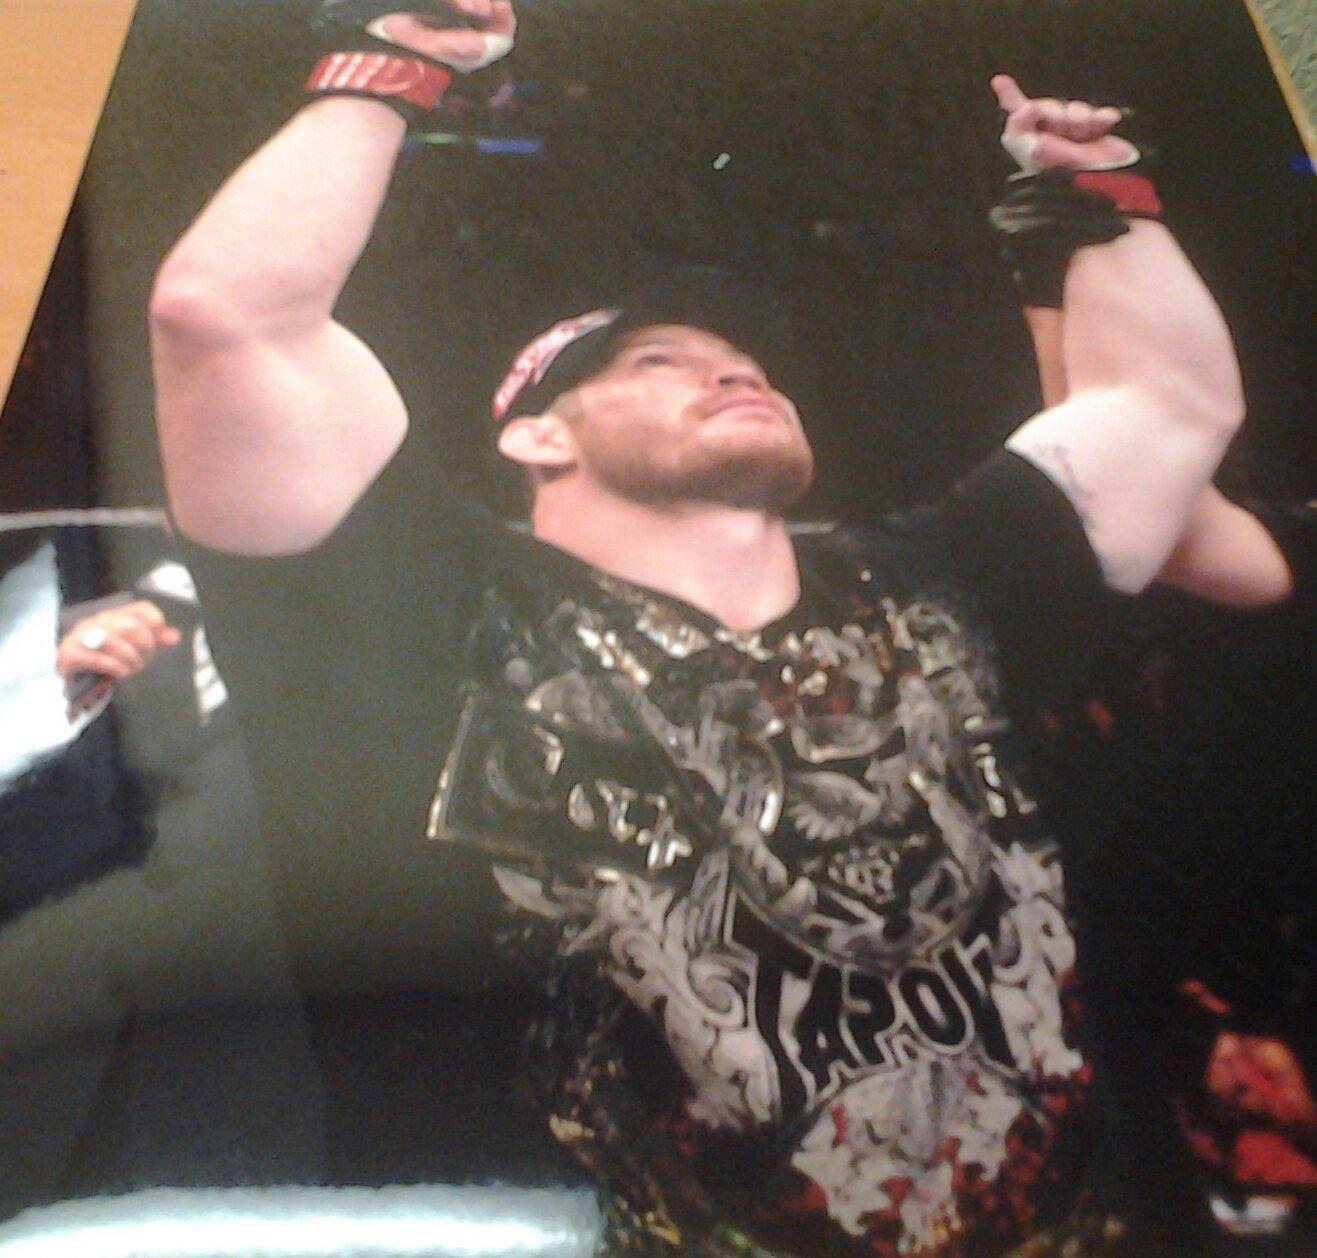 UFC MMA NATE MARQUARDT wins 8x10 photo